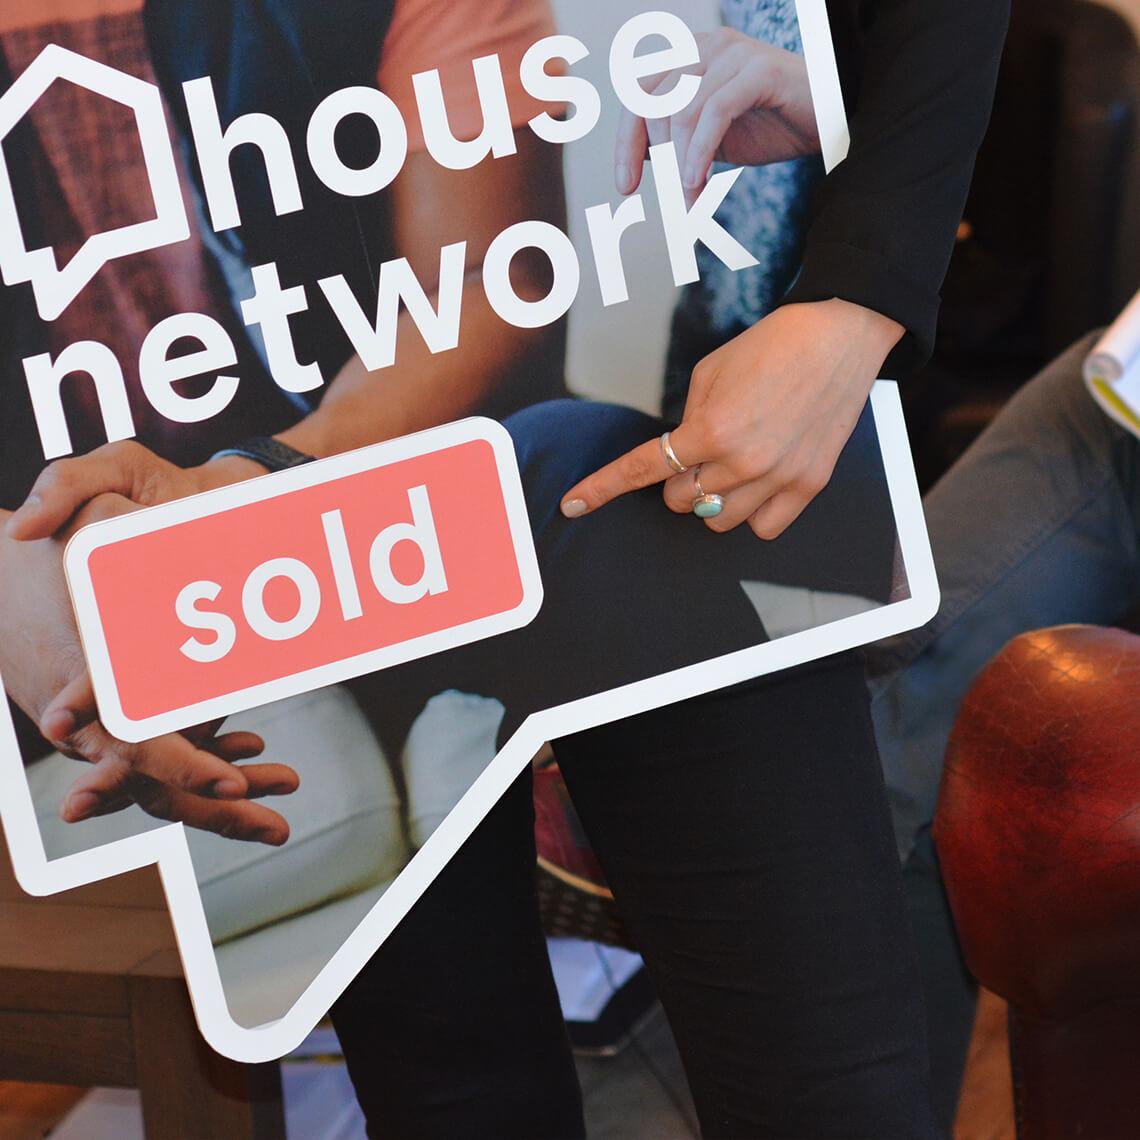 house_network_development_2